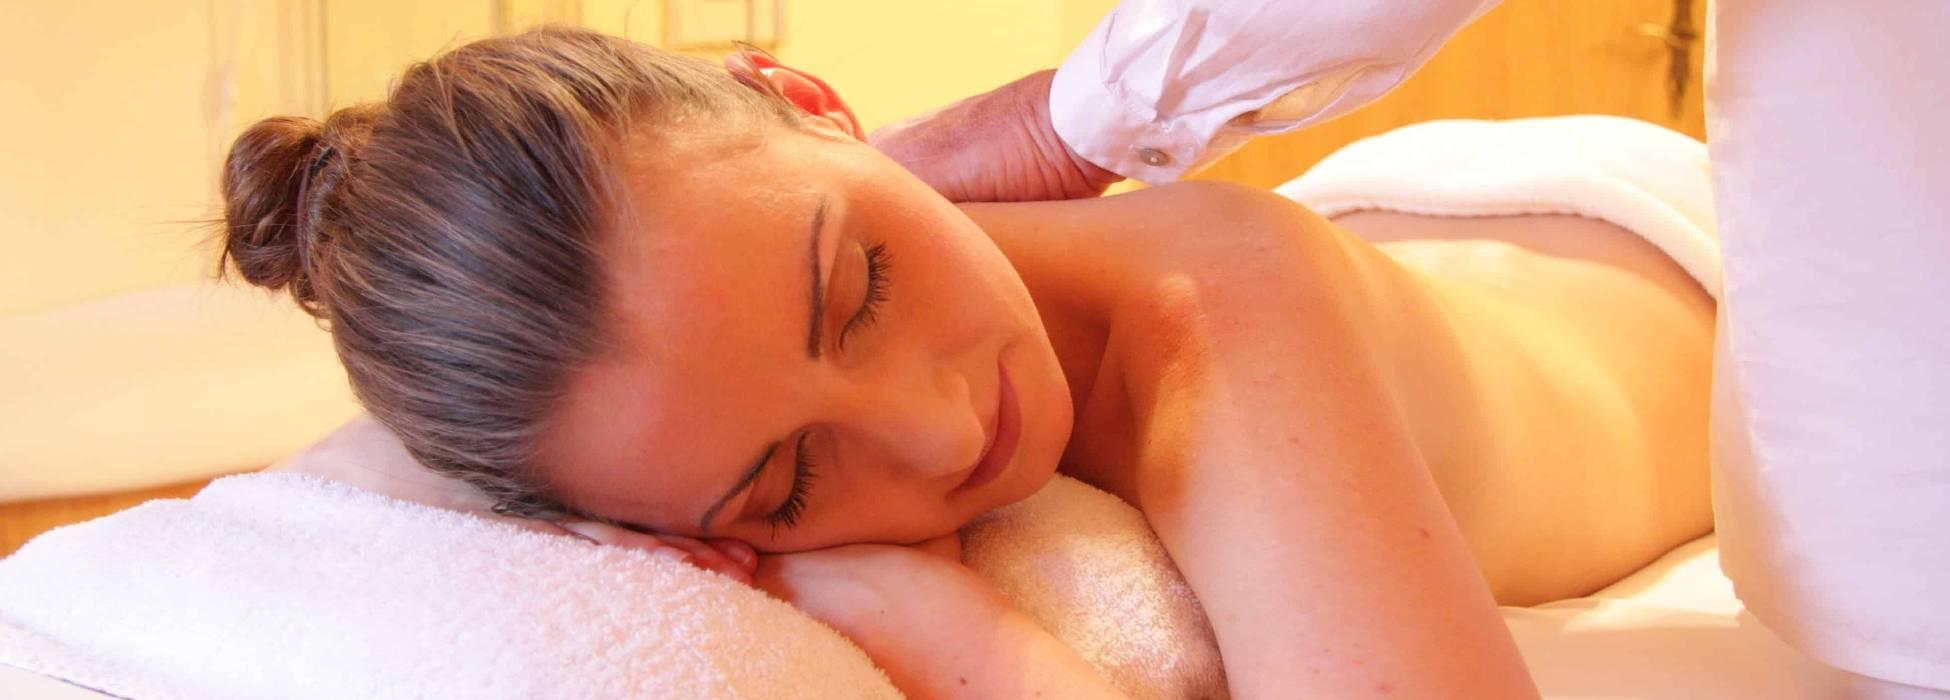 Sports Massage / Holistic Therapies